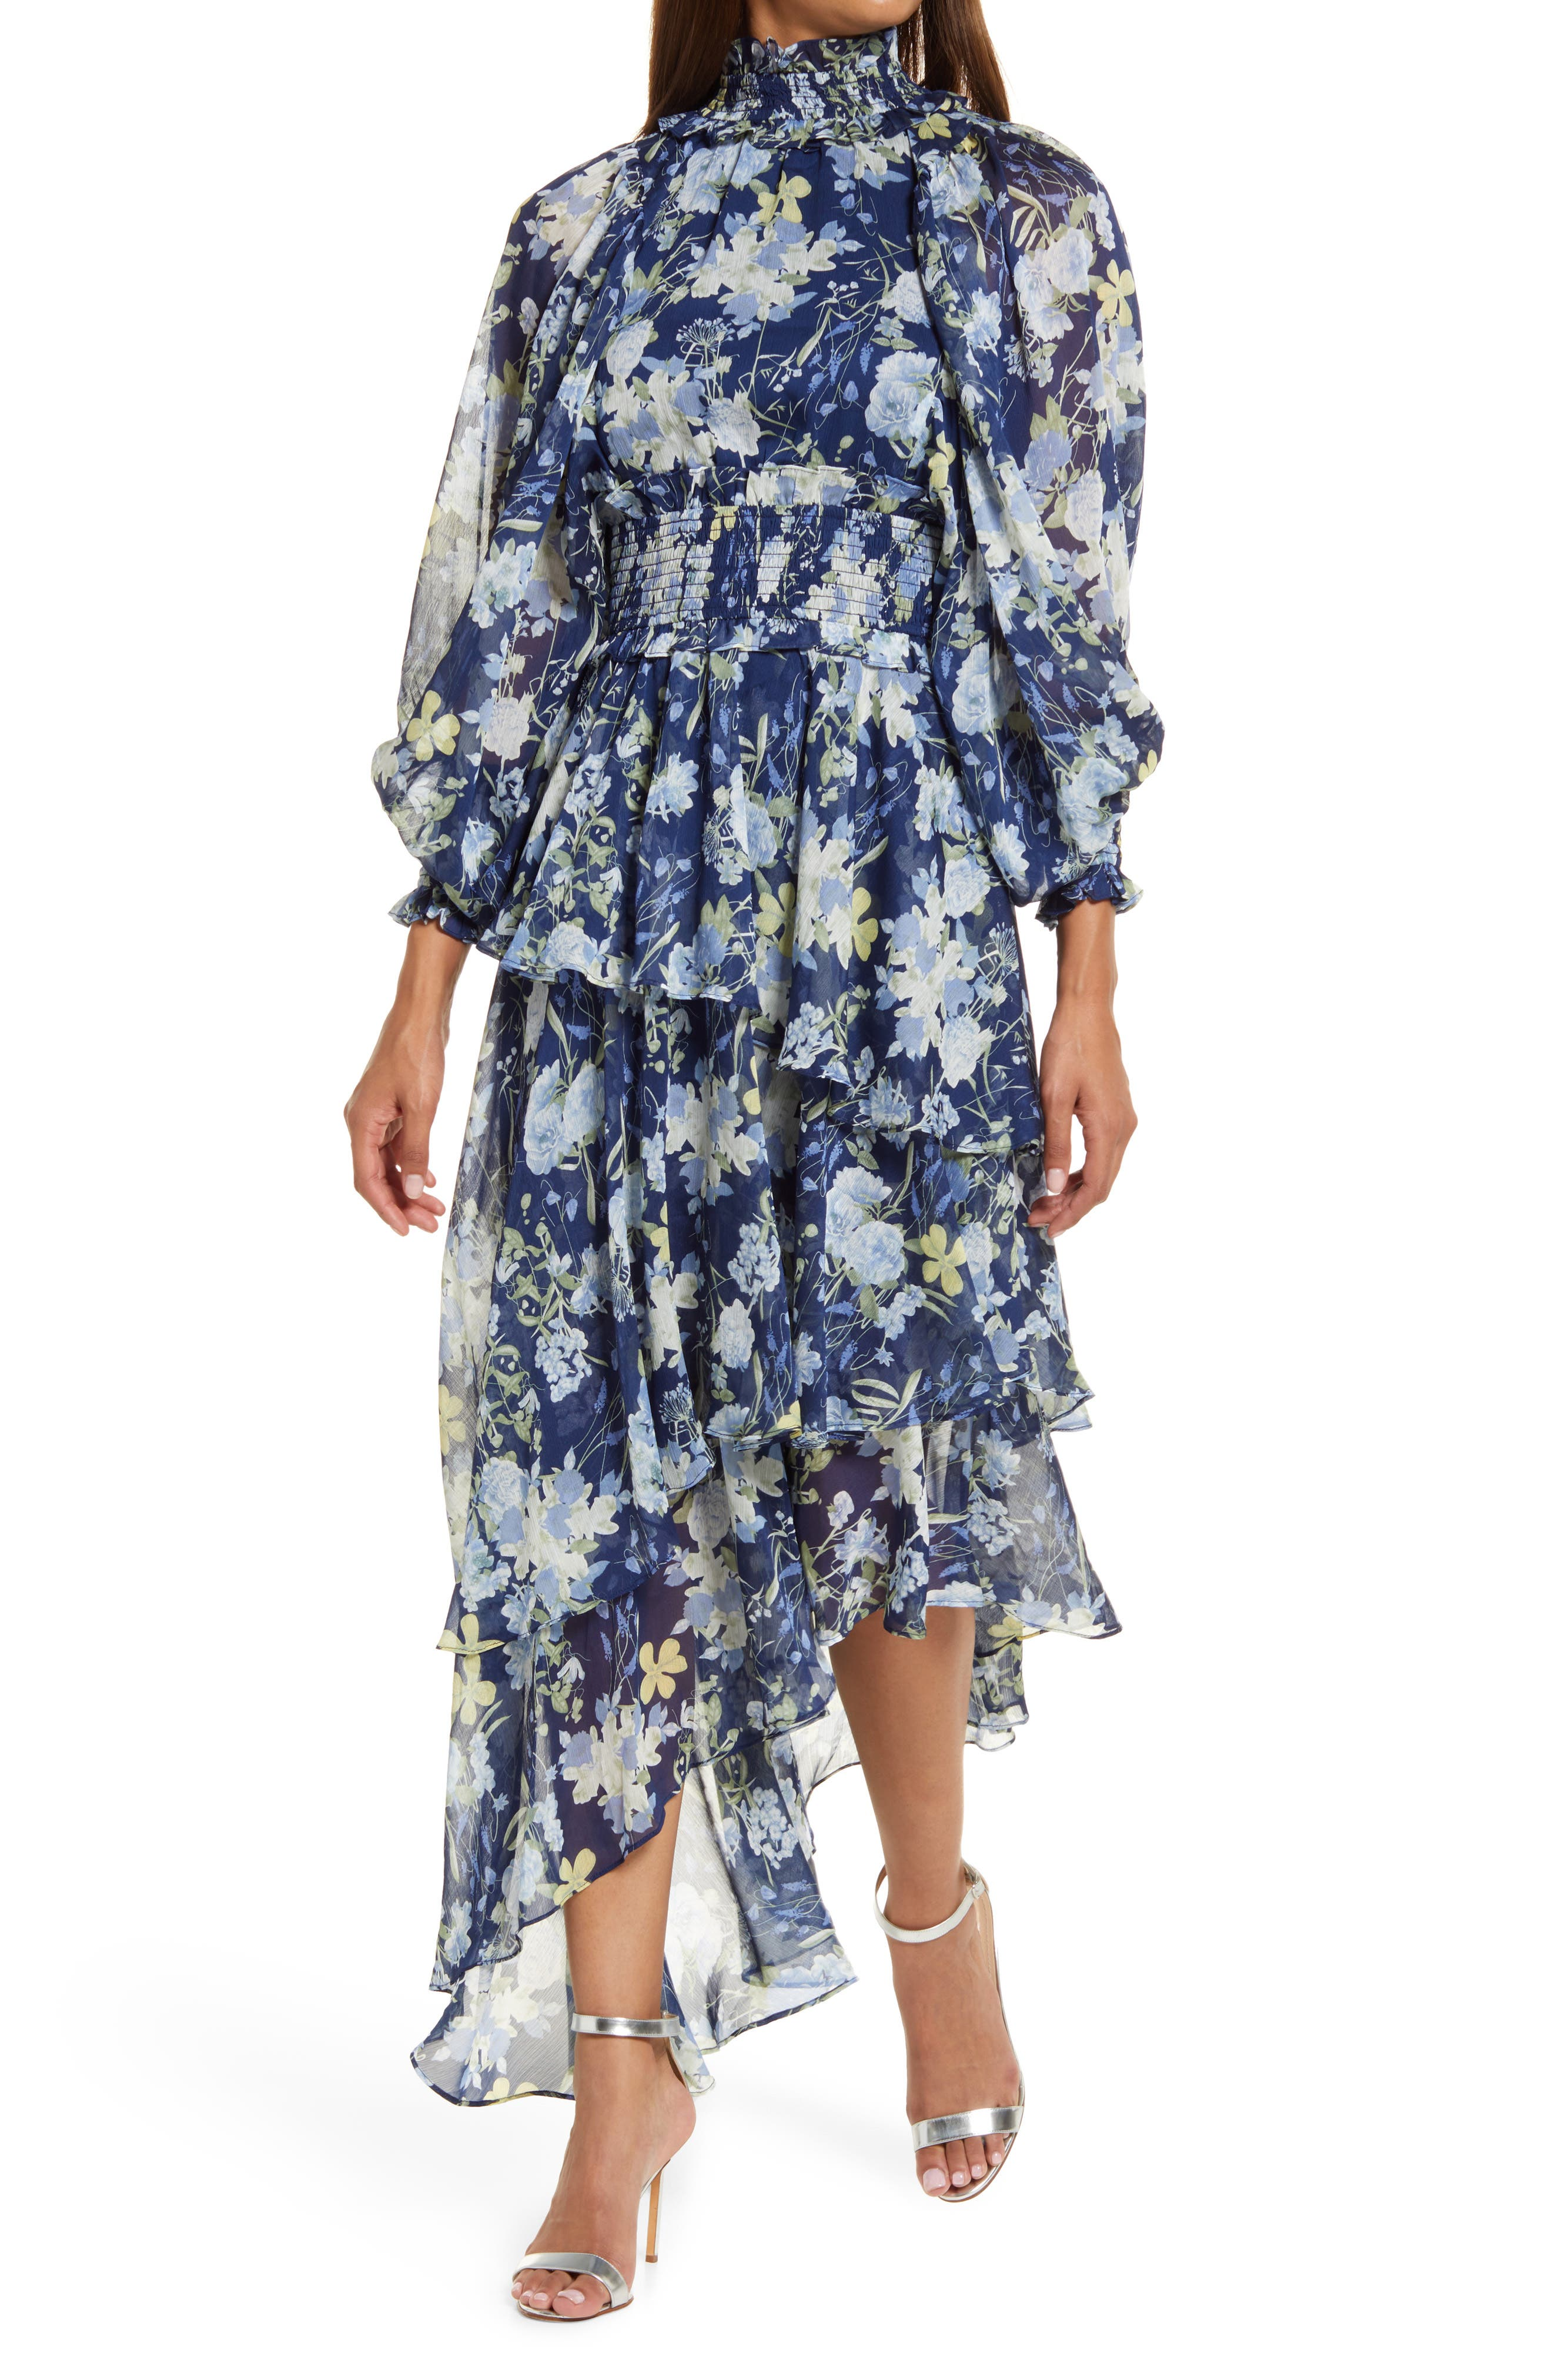 Astrid Floral Print Smocked Long Sleeve Dress